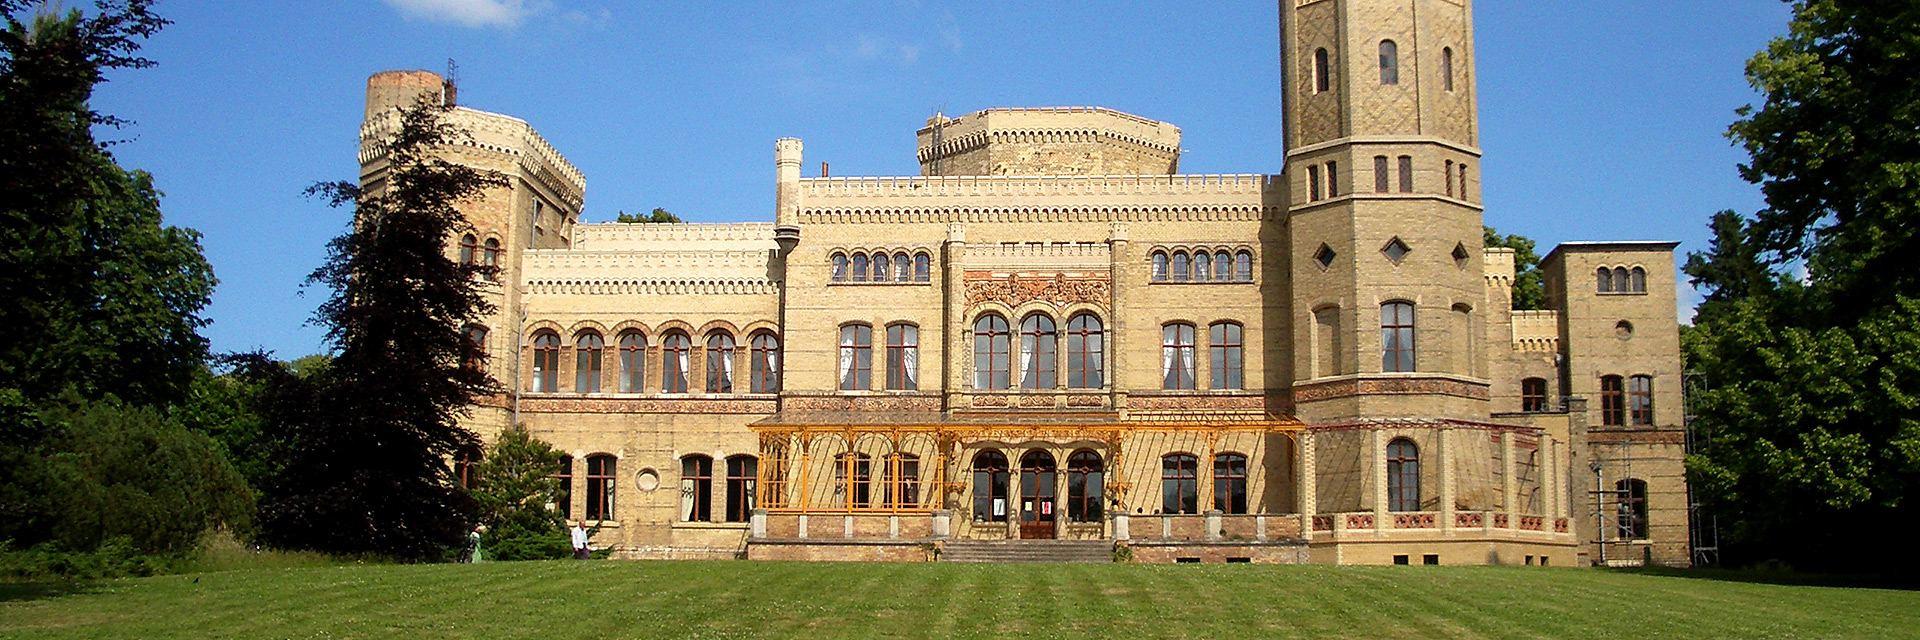 Romantisk slotsferie i Neetzow, Tyskland